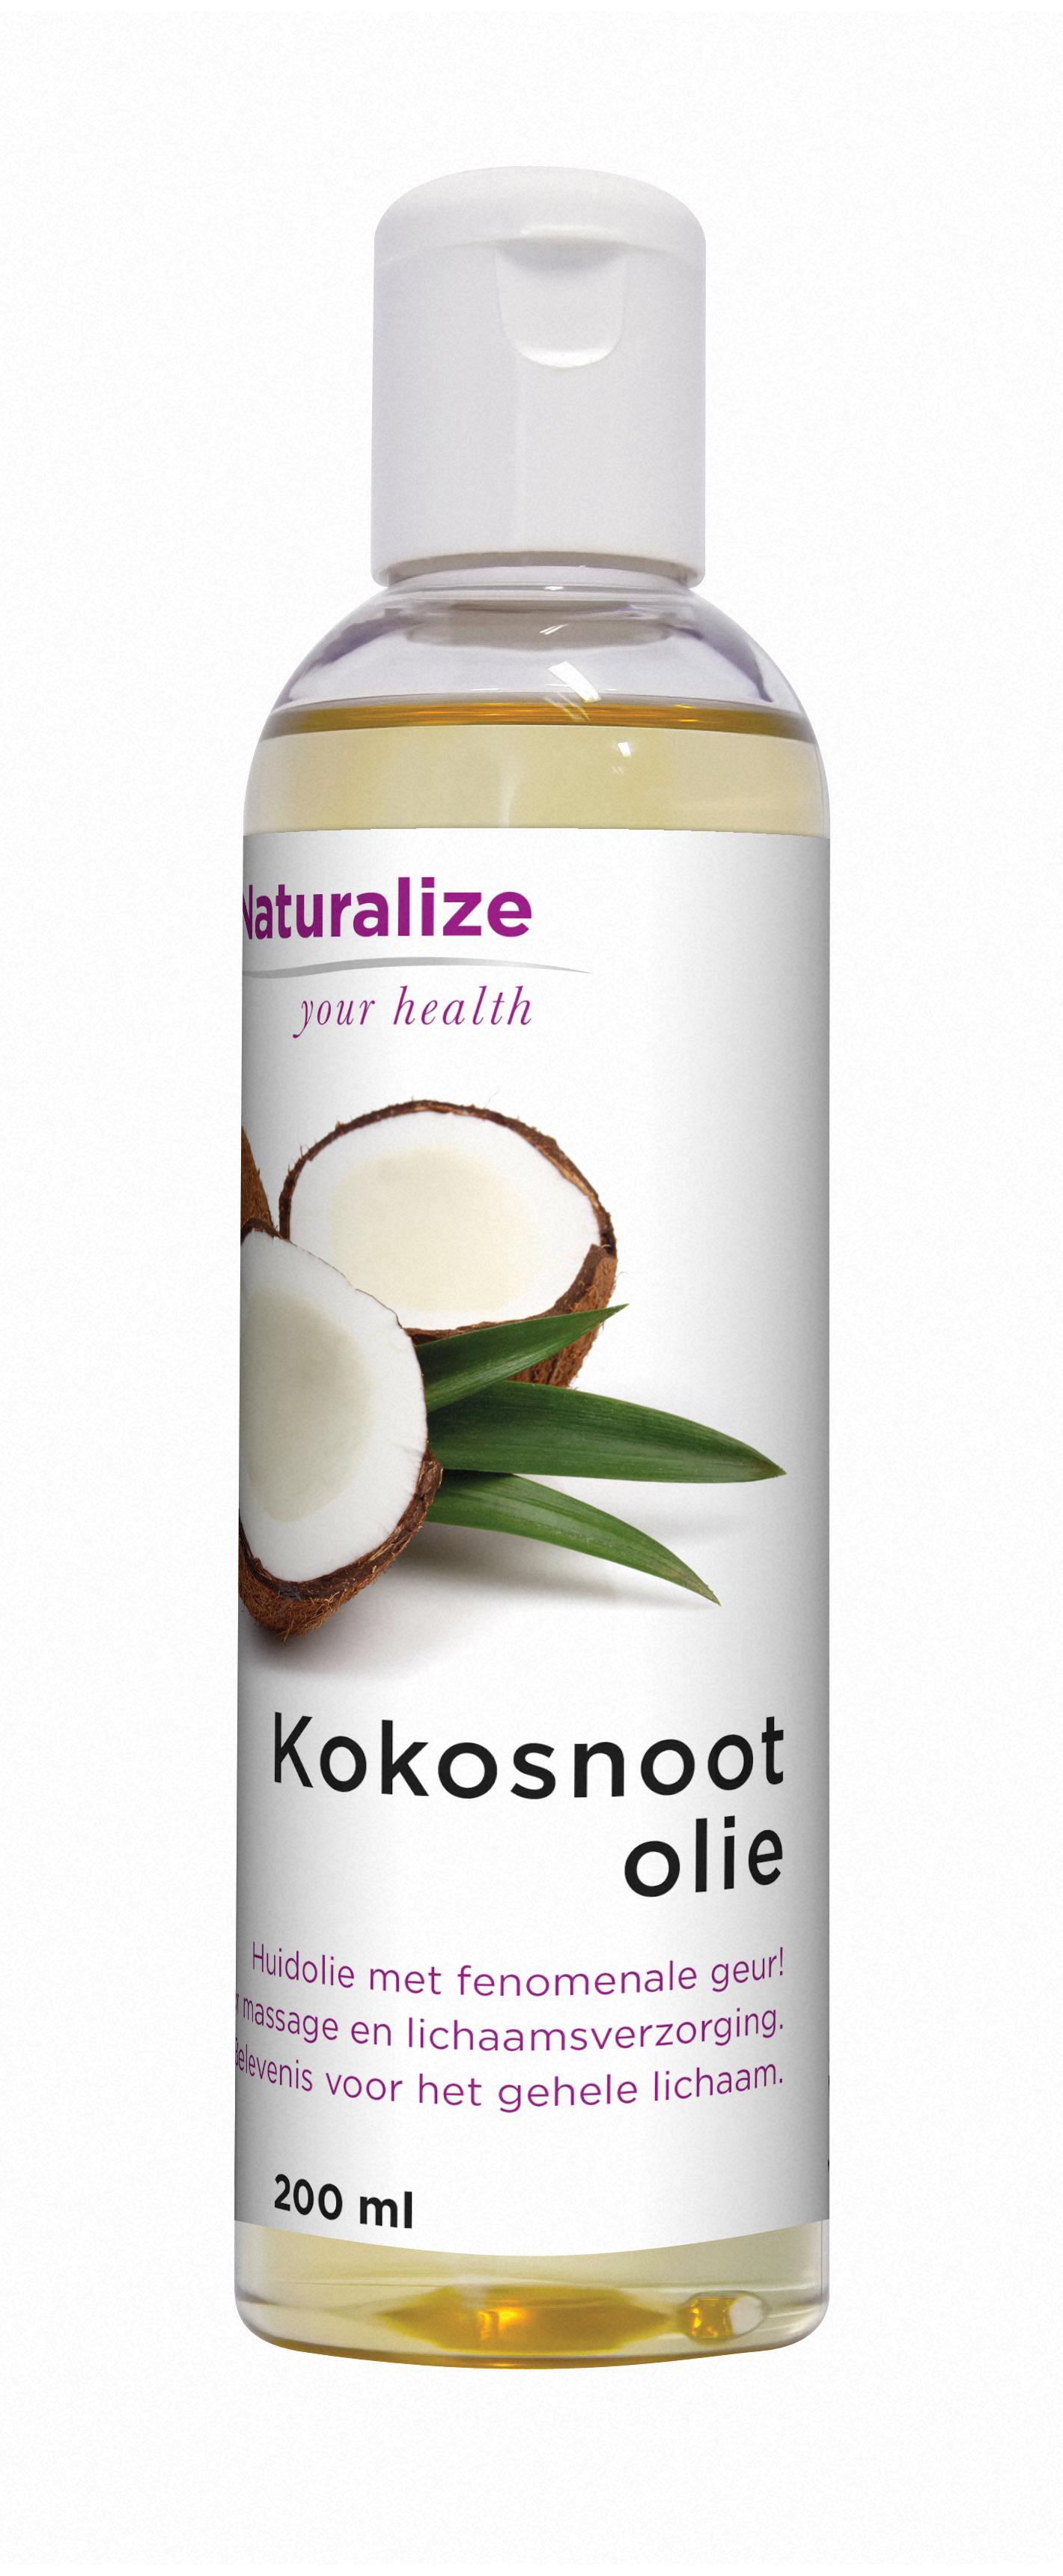 Naturalize Kokosnootolie (200 milliliter)